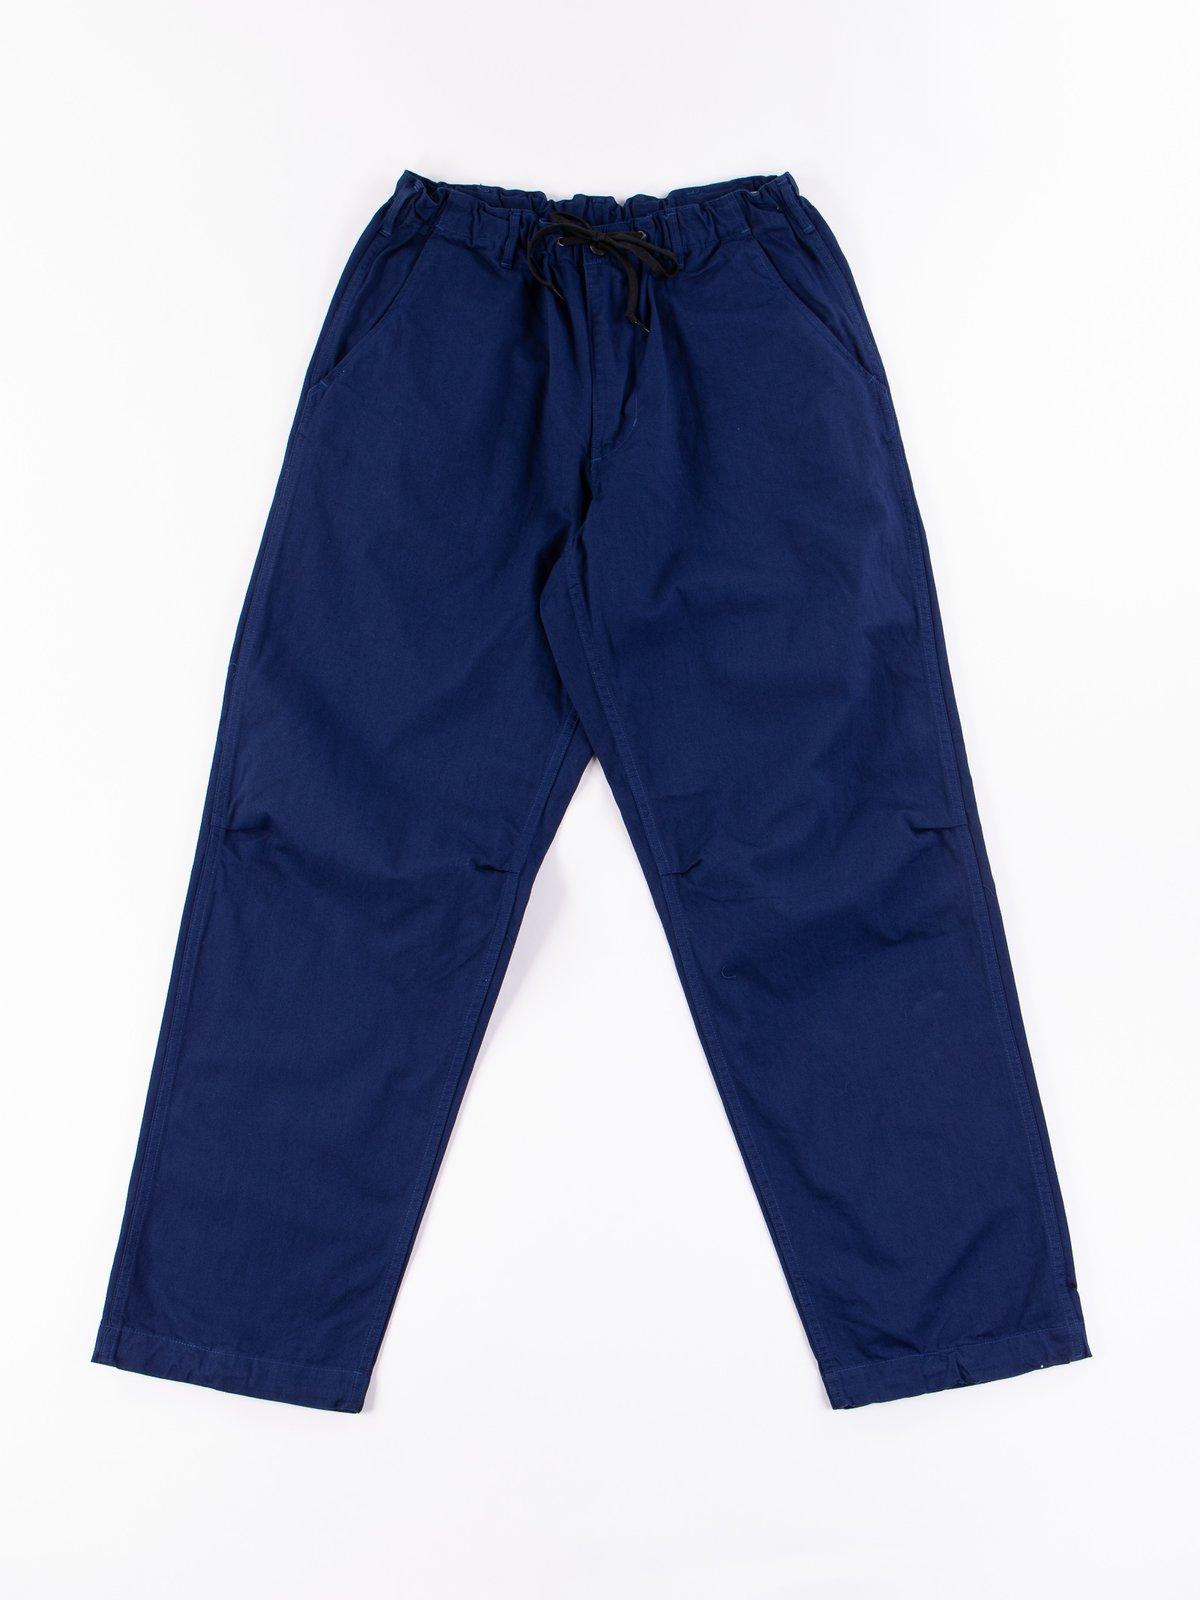 Ink Blue Herringbone TBB Service Pant - Image 1